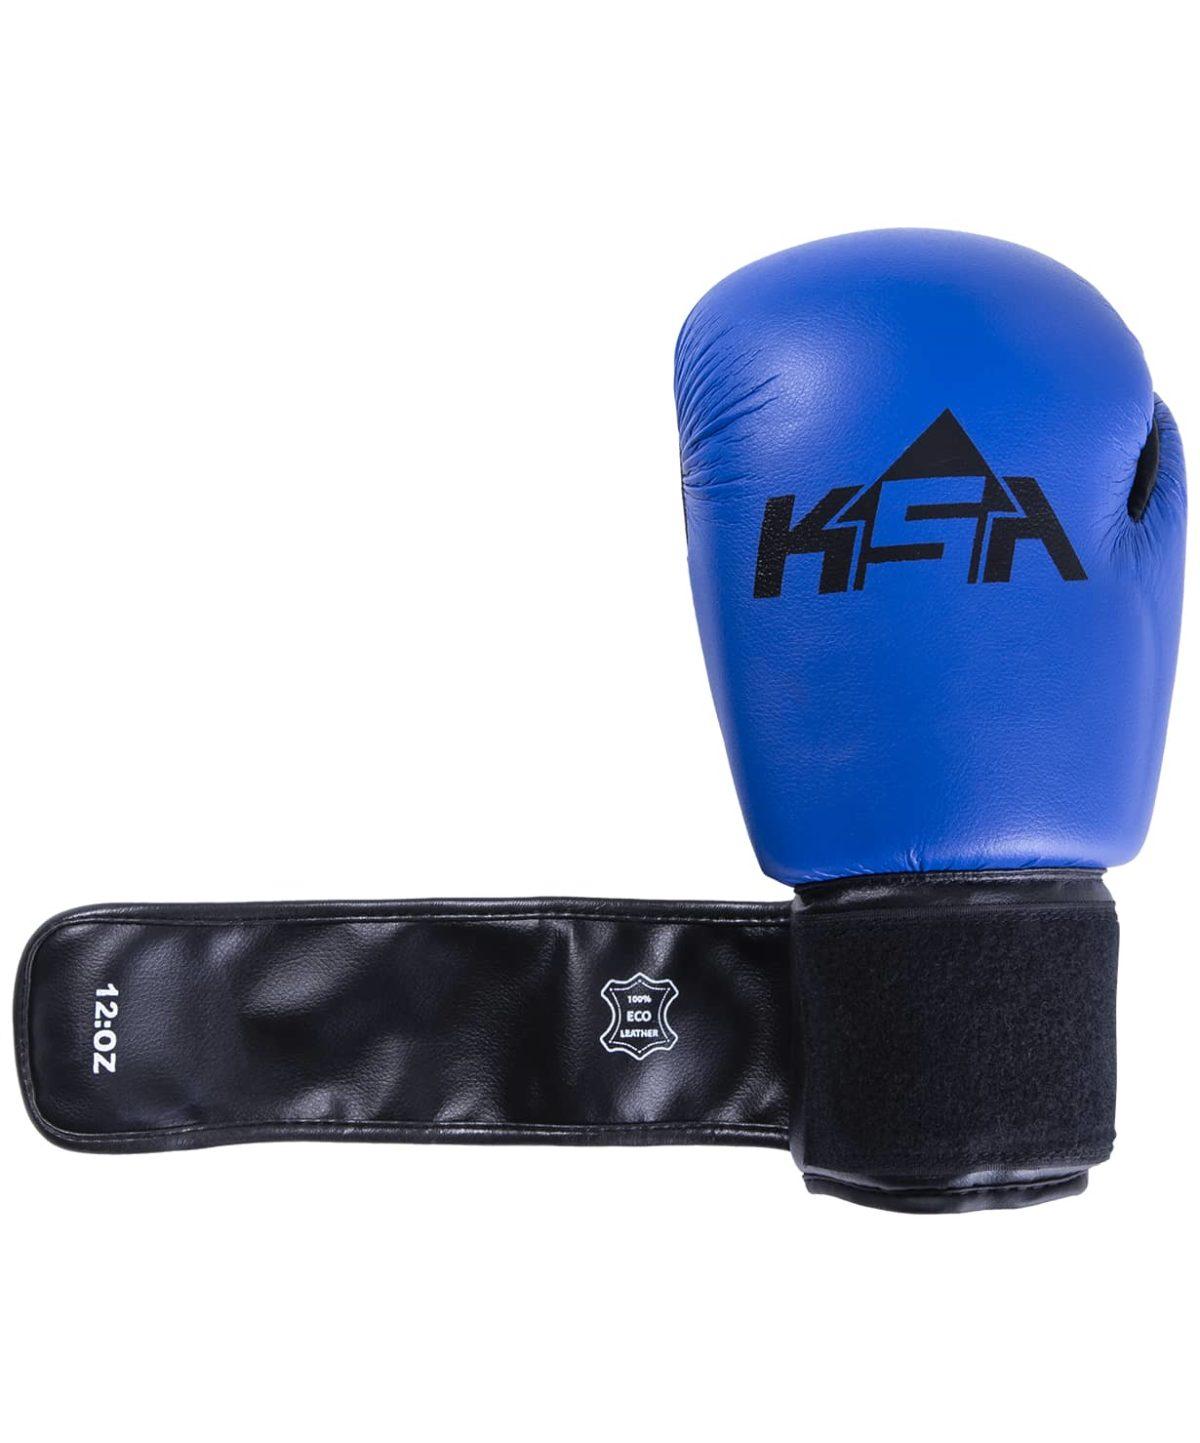 KSA Spider Blue Перчатки боксерские, 8 oz, к/з 17805: синий - 2